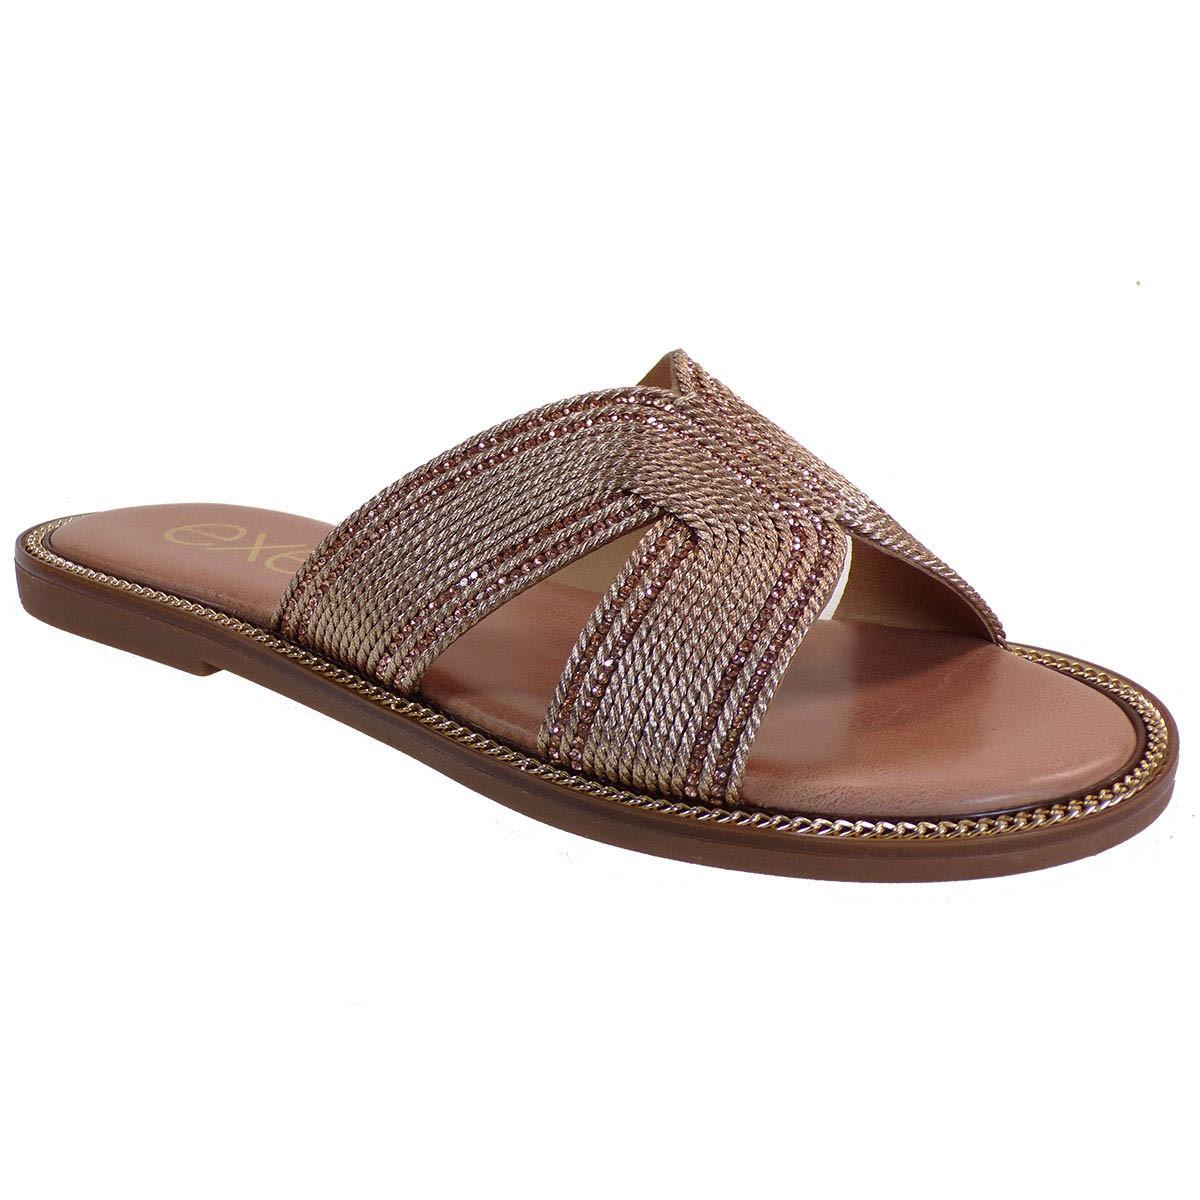 EXE Shoes Γυναικείες Παντόφλες ARIANA-158 Ροζ Χρυσό Στρας M47001581P50